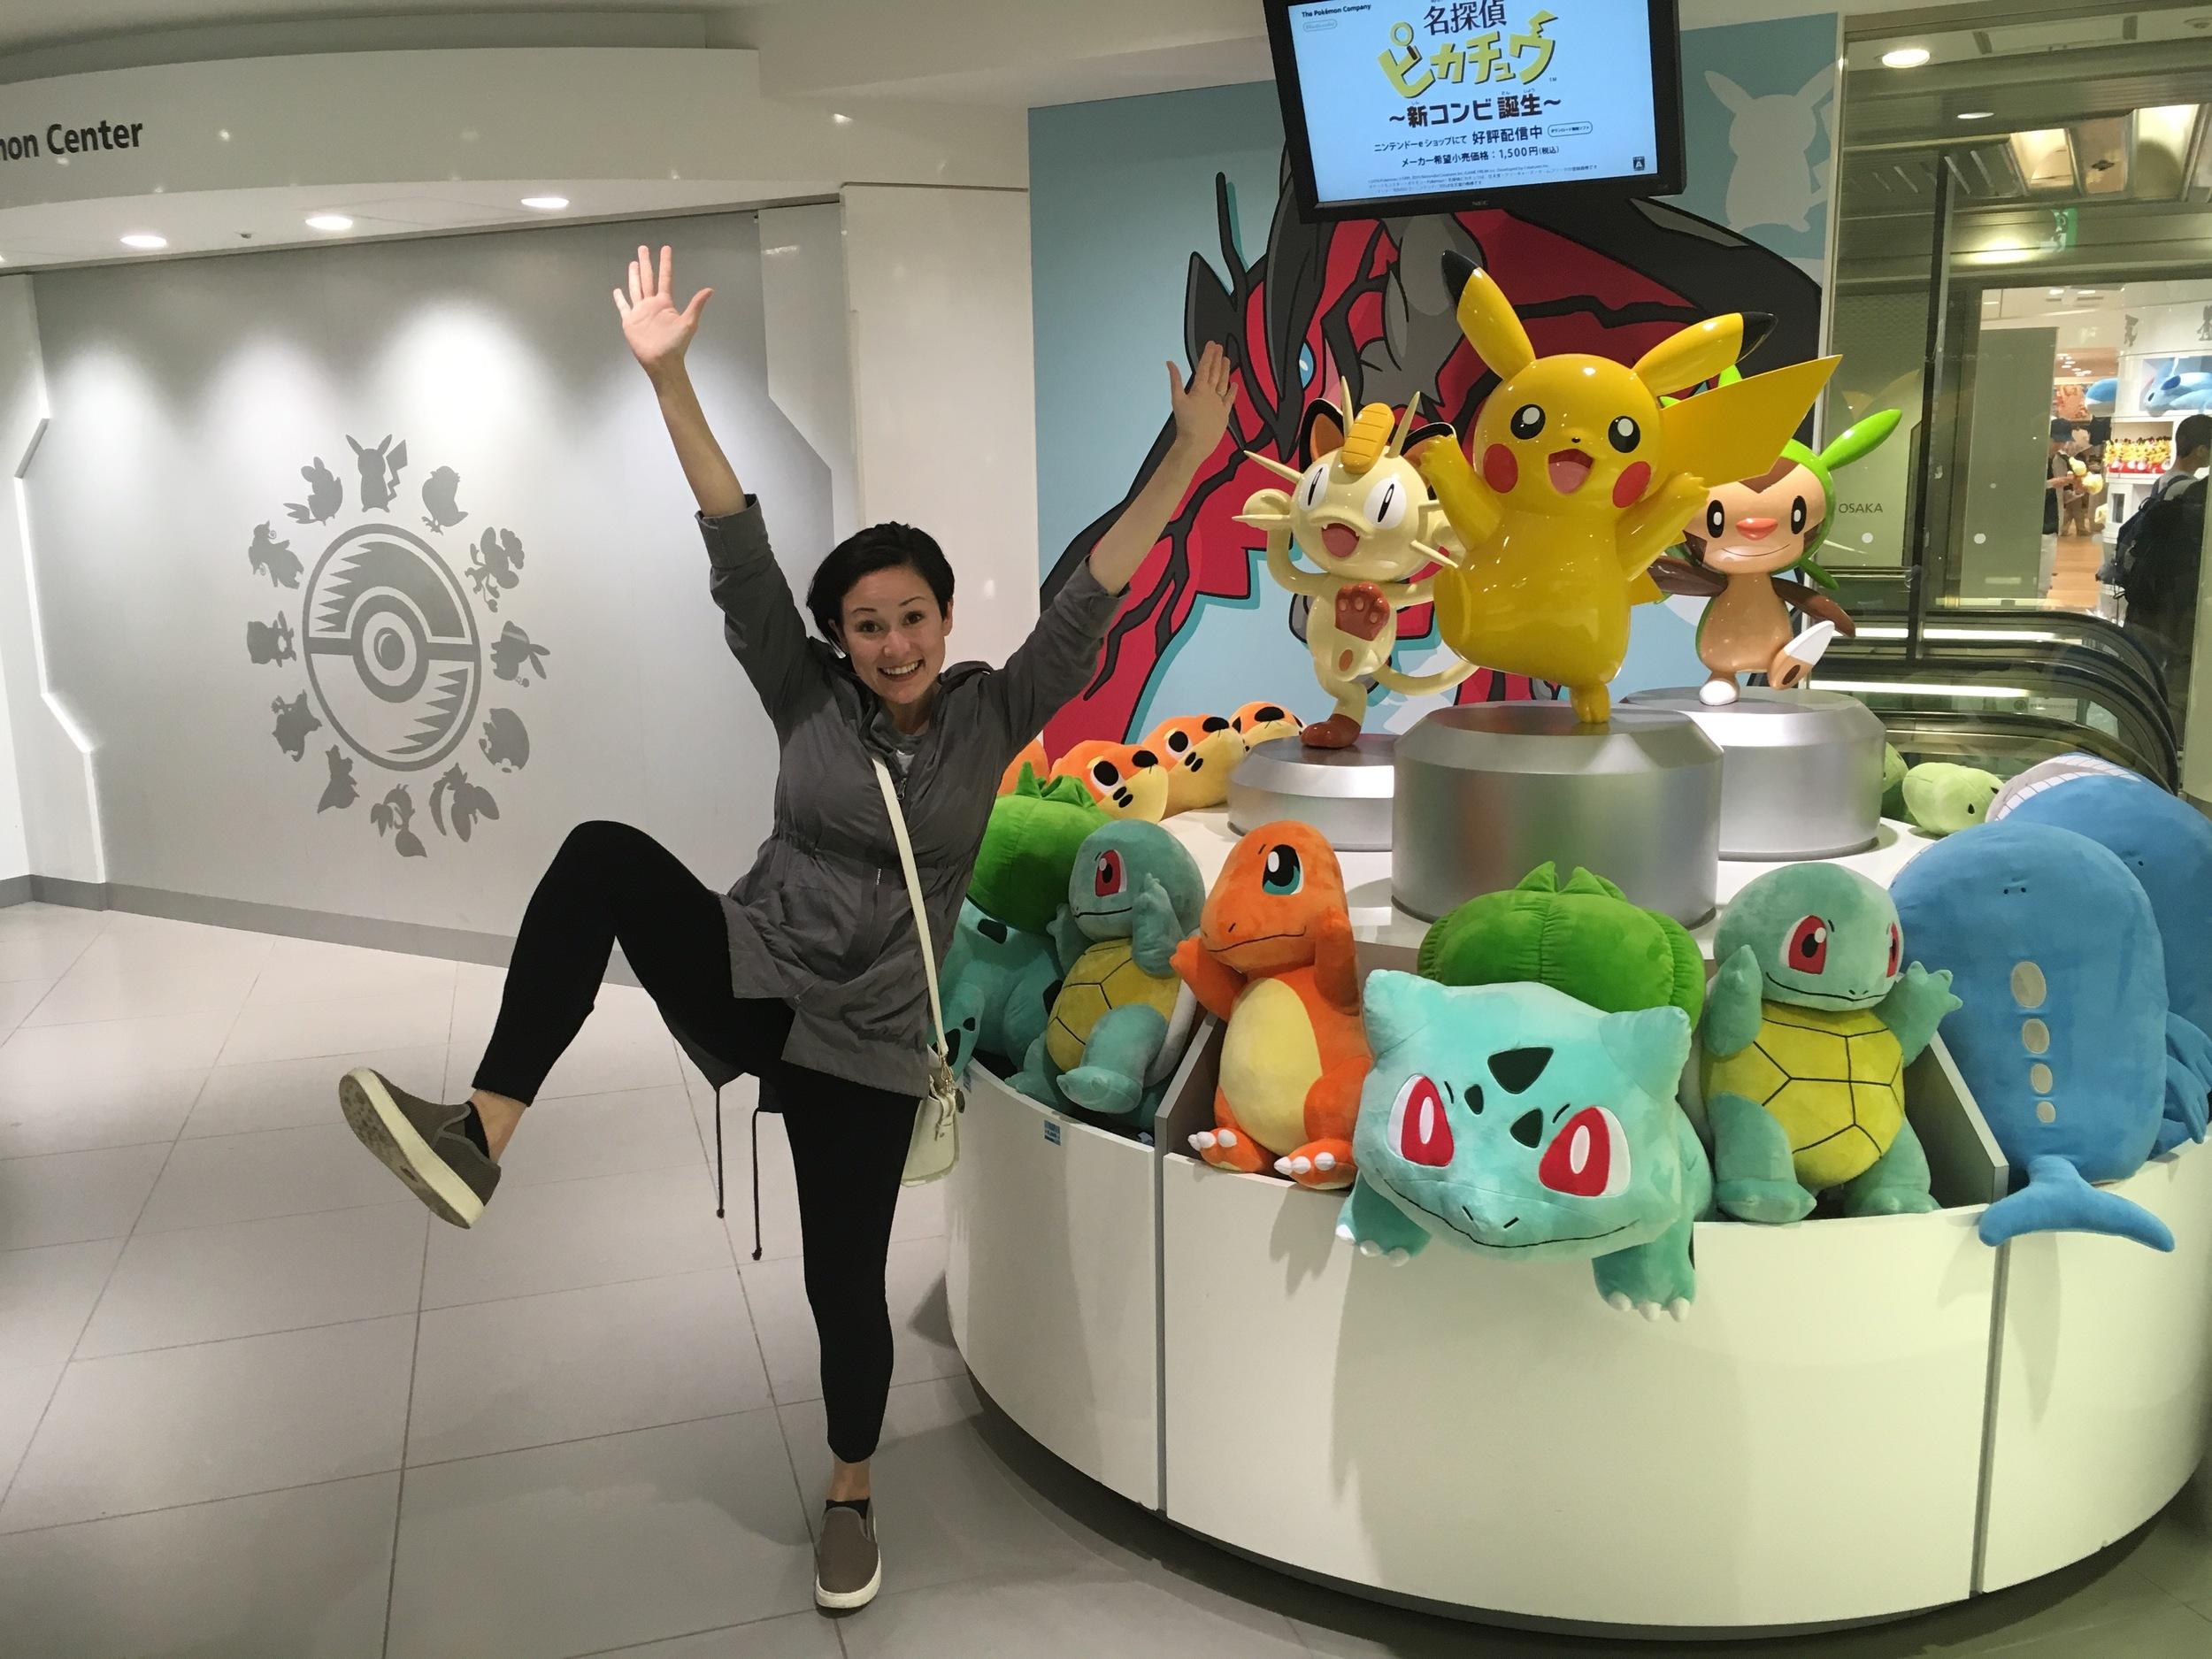 Acting like a Pikachu...